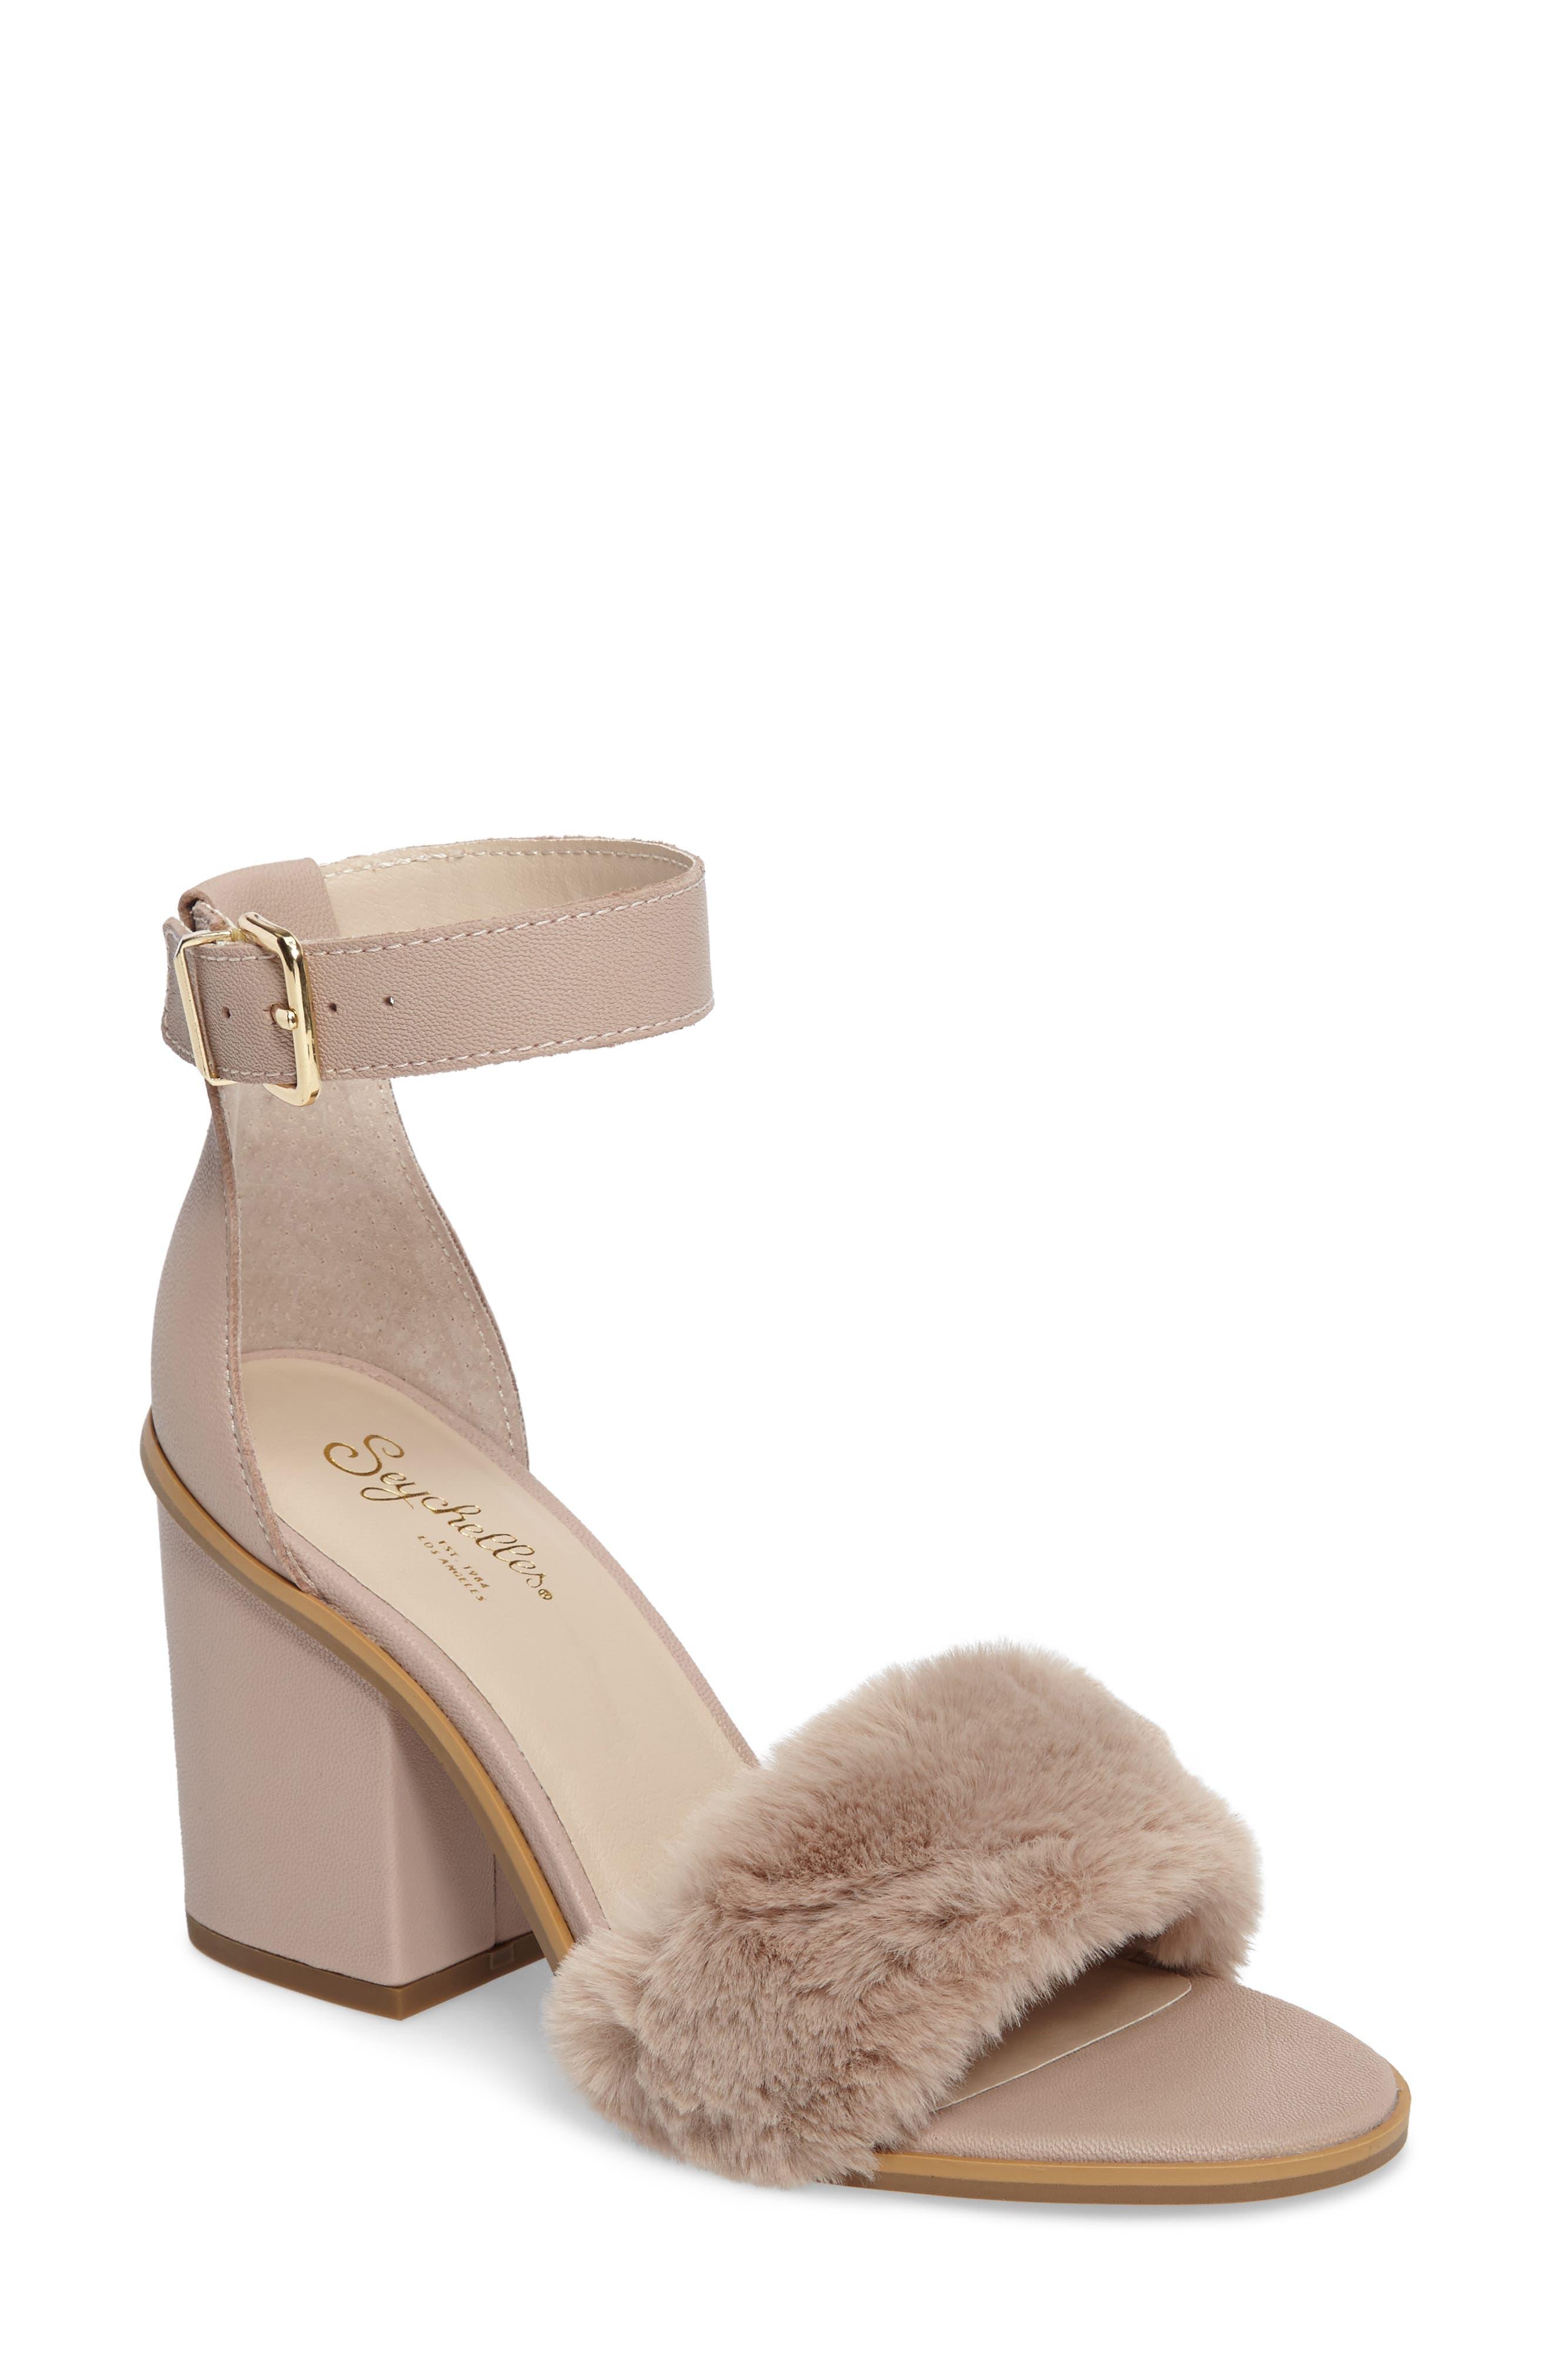 Alternate Image 1 Selected - Seychelles Faux Fur Ankle Strap Sandal (Women)